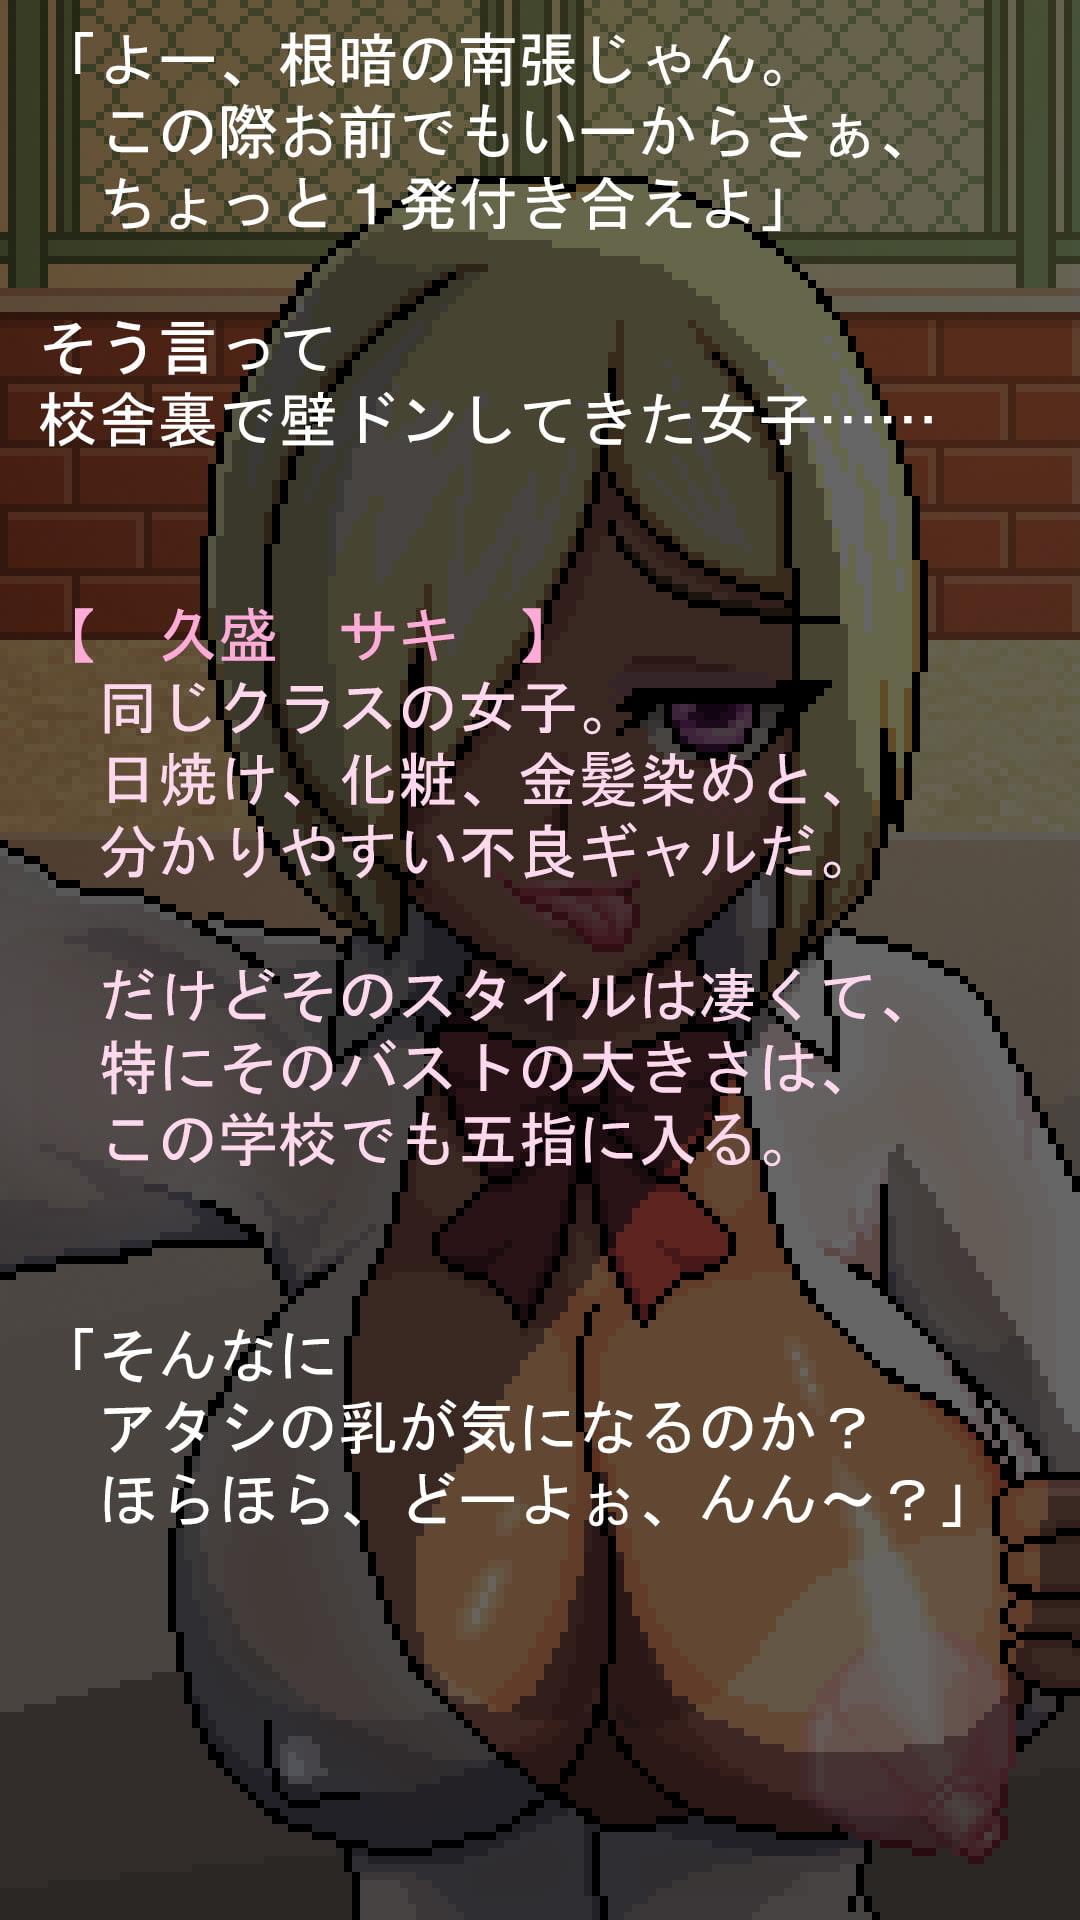 MILK*乙女パイ - 久盛 サキ -